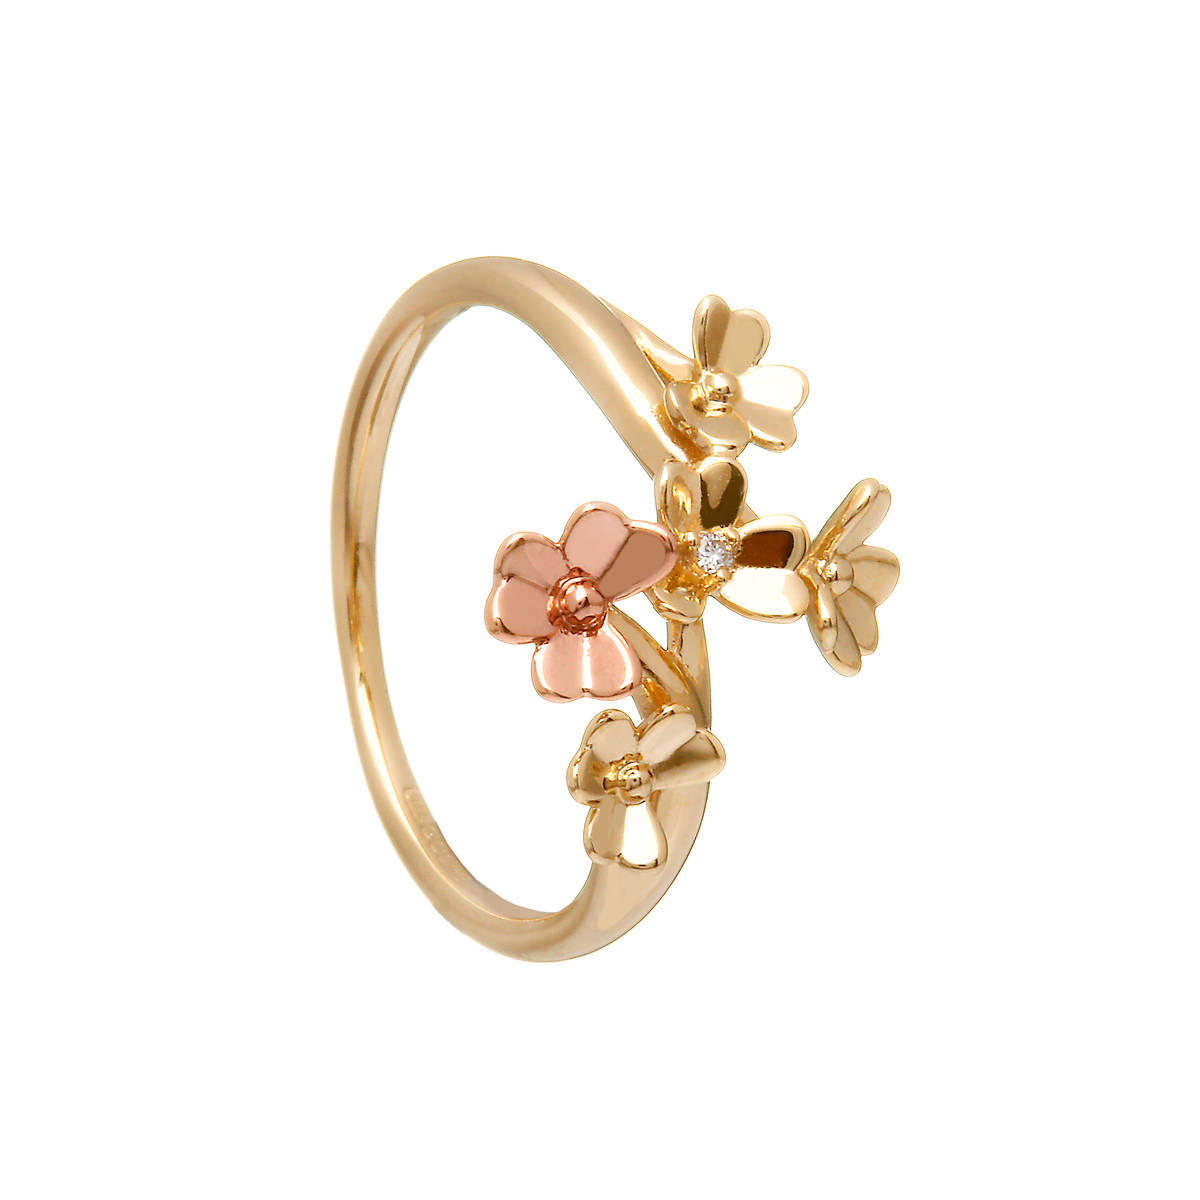 9 carat yellow gold love shamrock spray ring, diamond set, with one rare Irish rose gold flower.